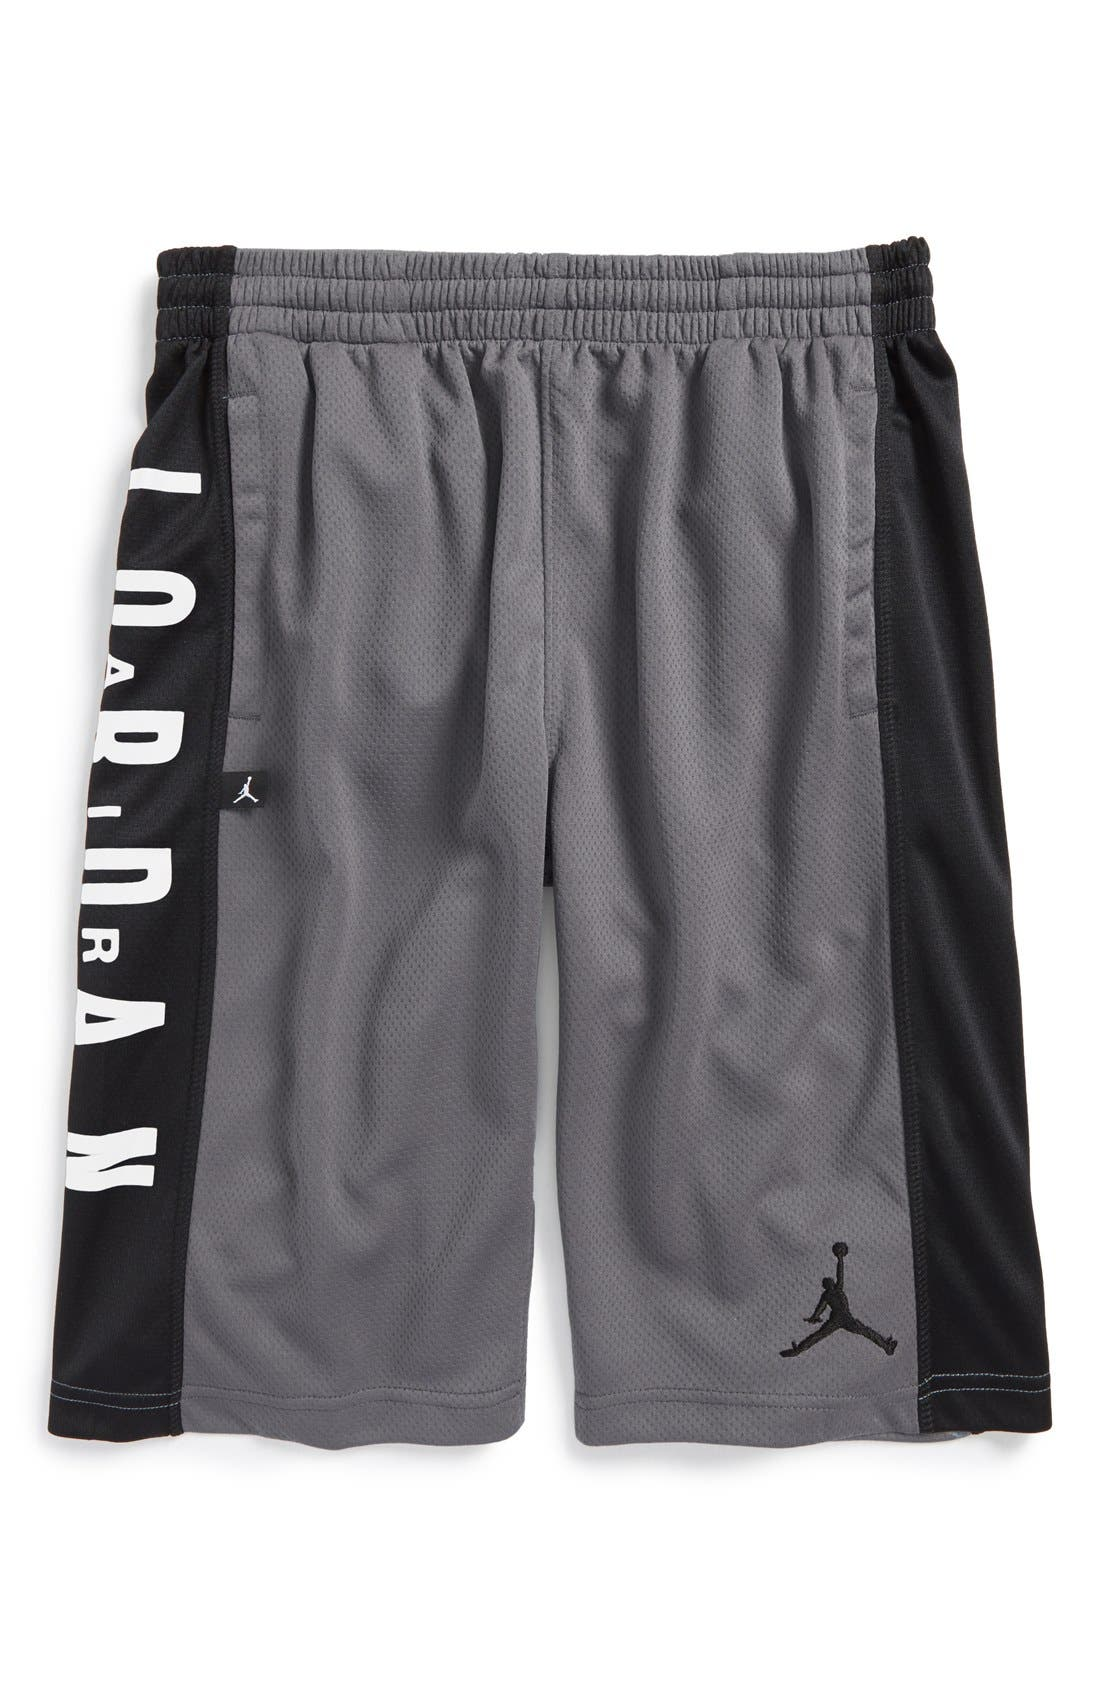 Main Image - Jordan 'Highlight' Basketball Shorts (Big Boys)